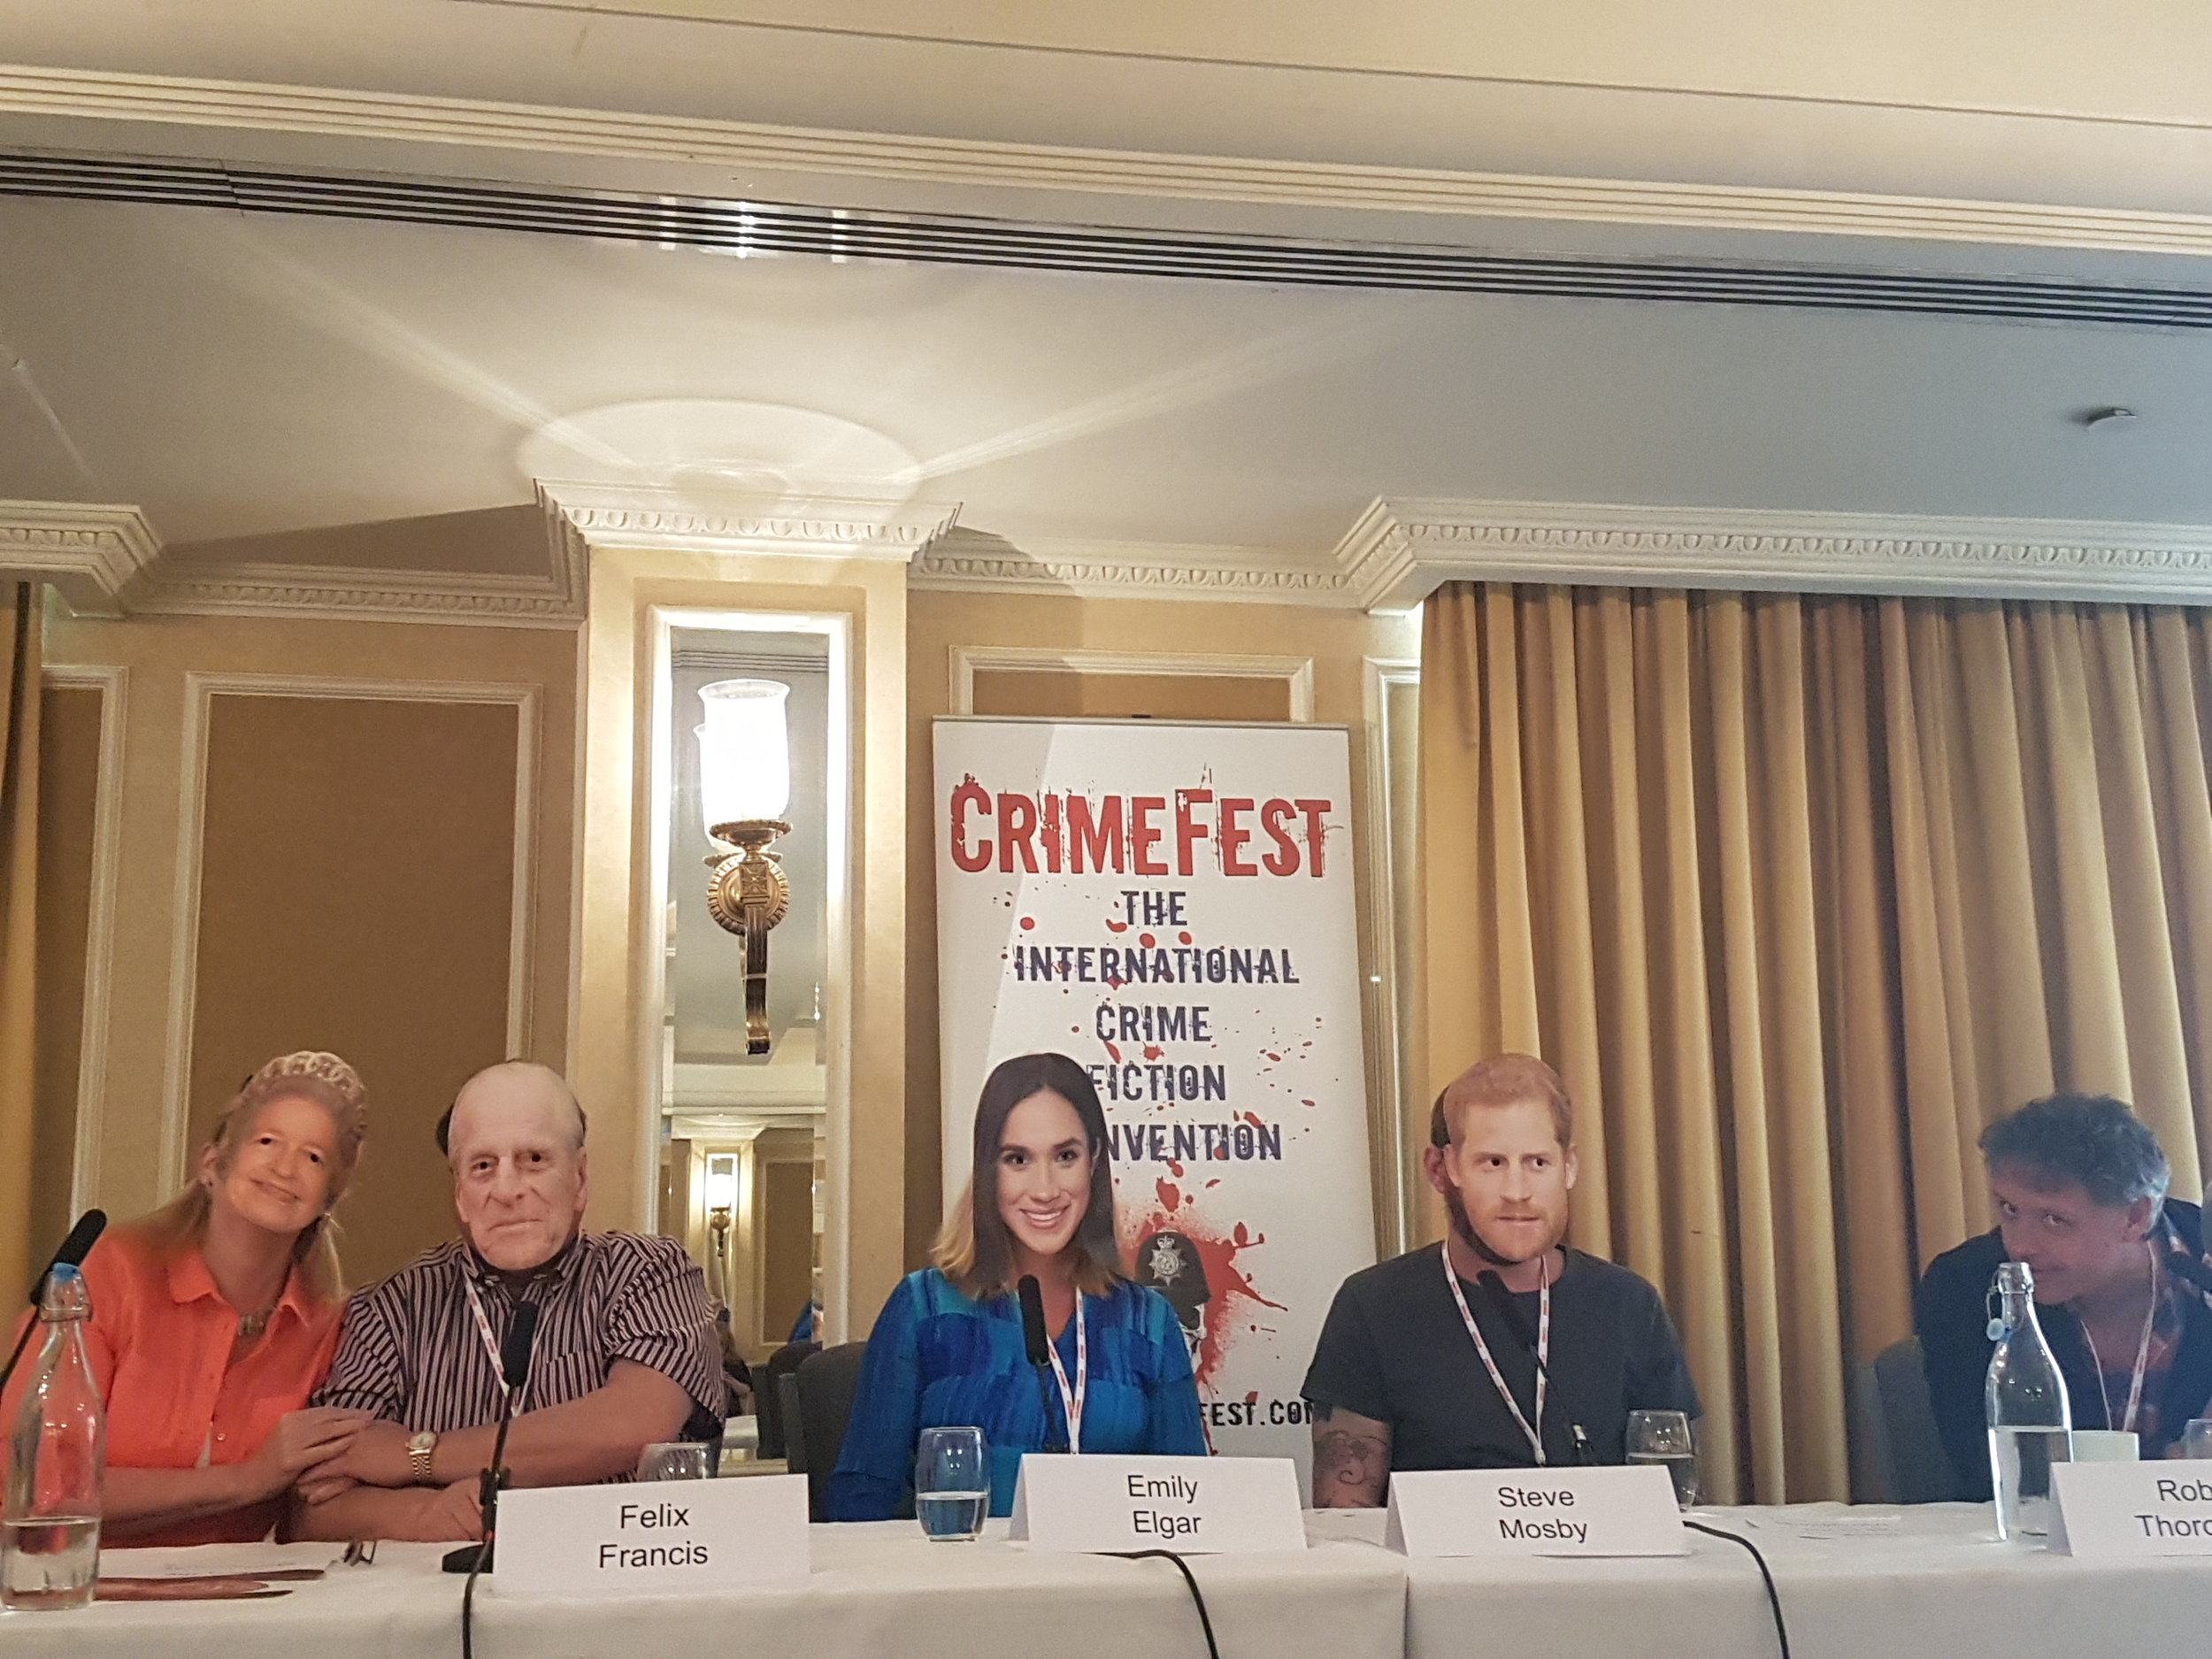 CrimeFest meets royal wedding